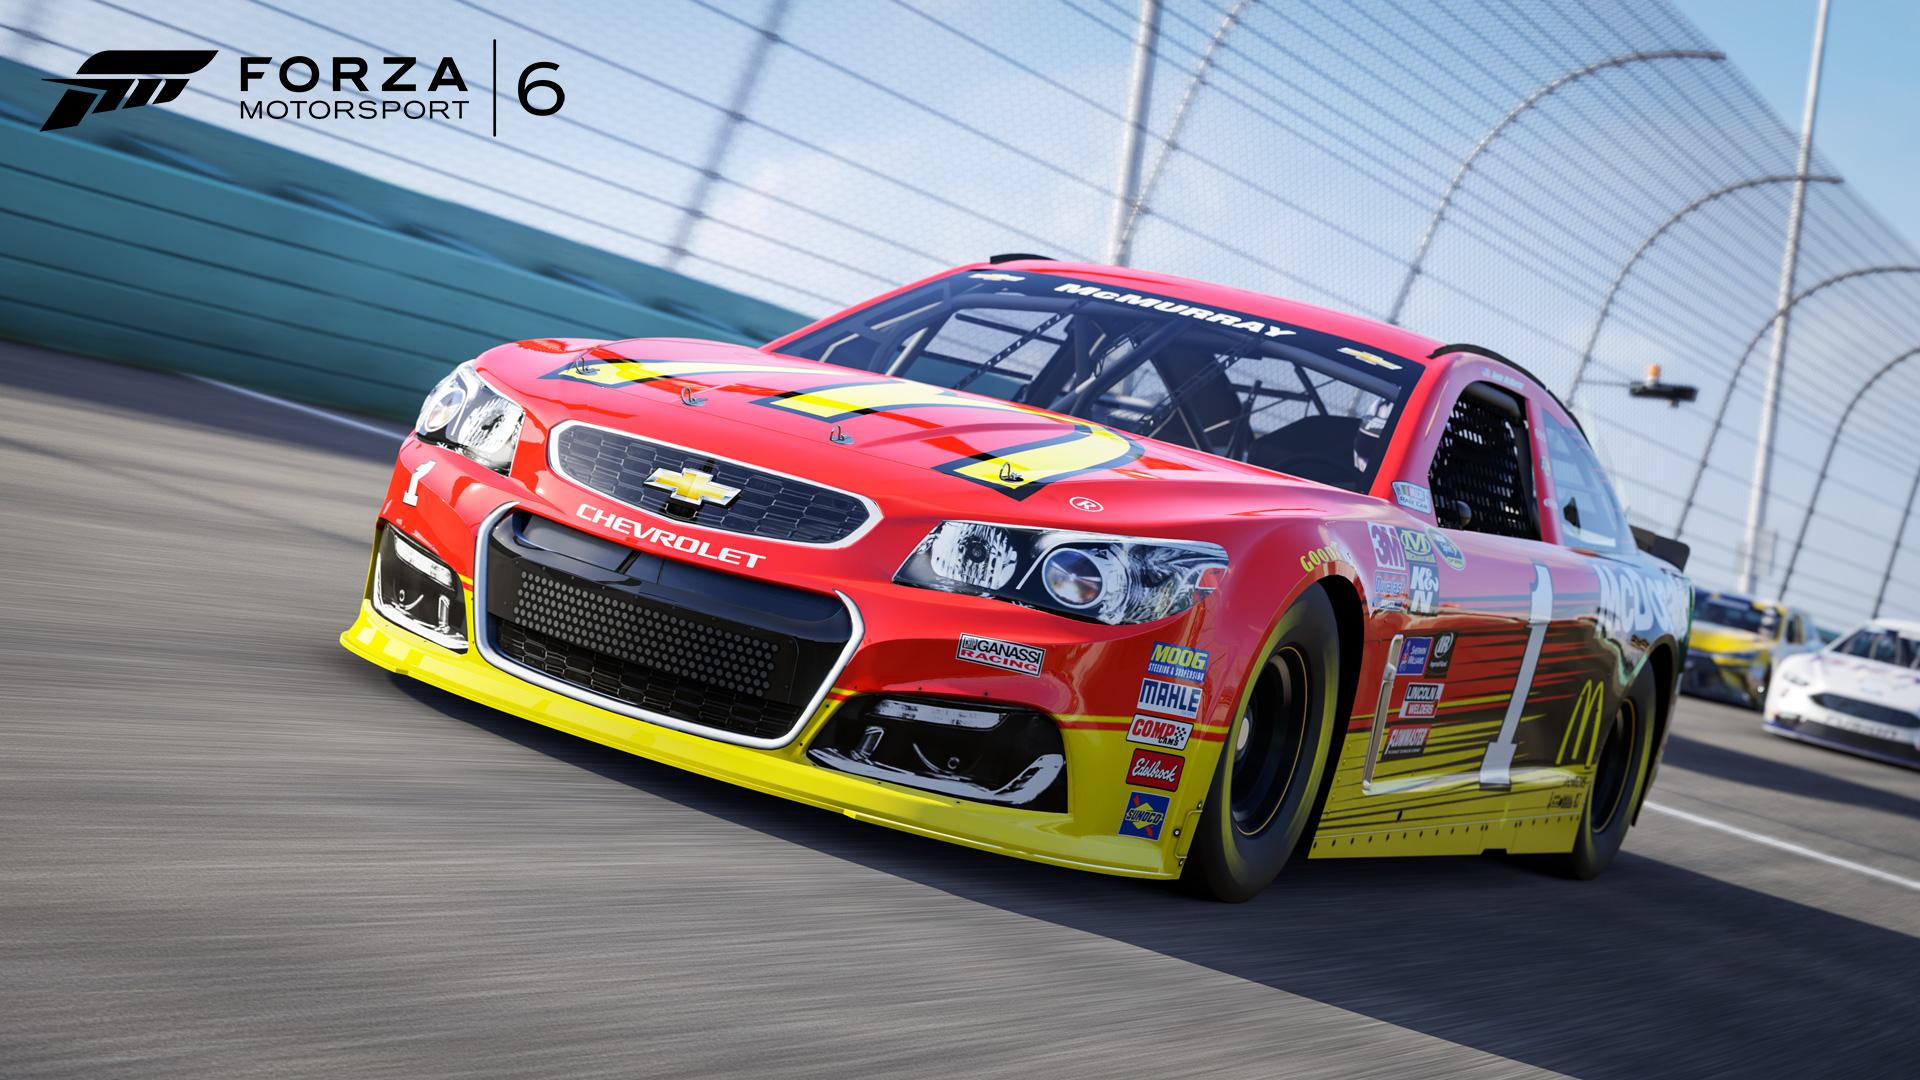 Forza Motorsport - Forza Motorsport 6 NASCAR Expansion